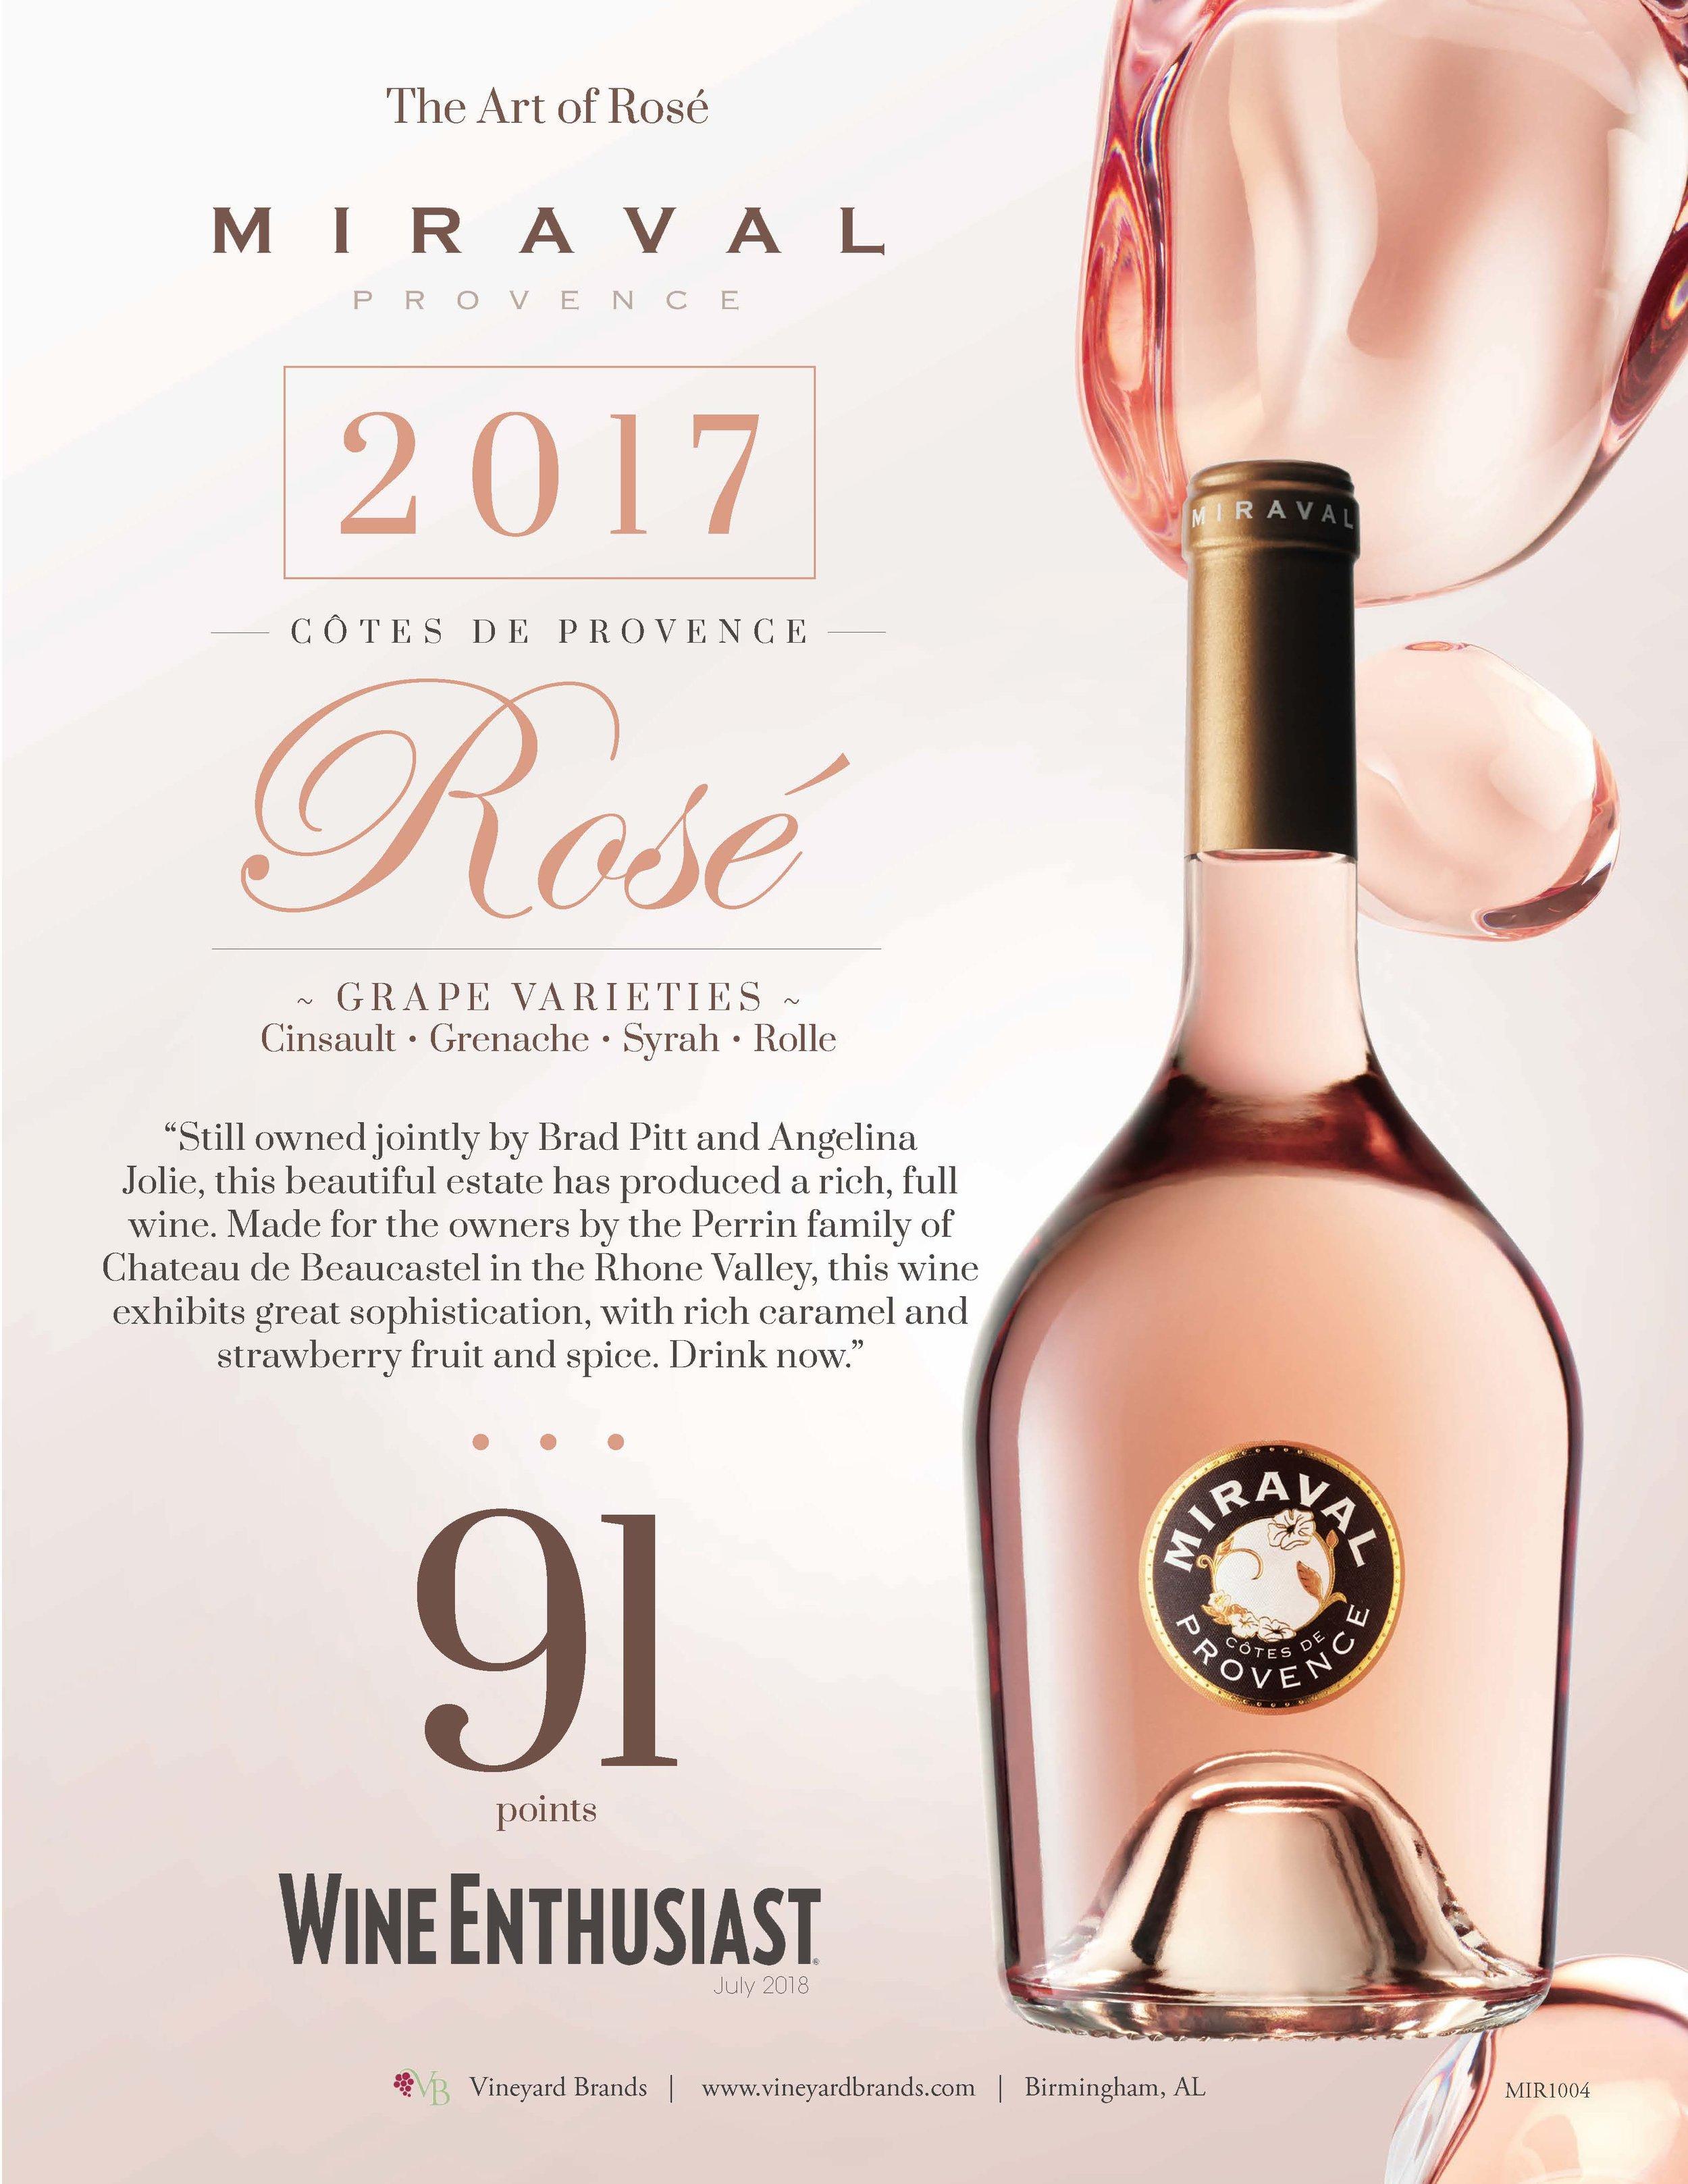 Miraval Rosé 2017.jpg